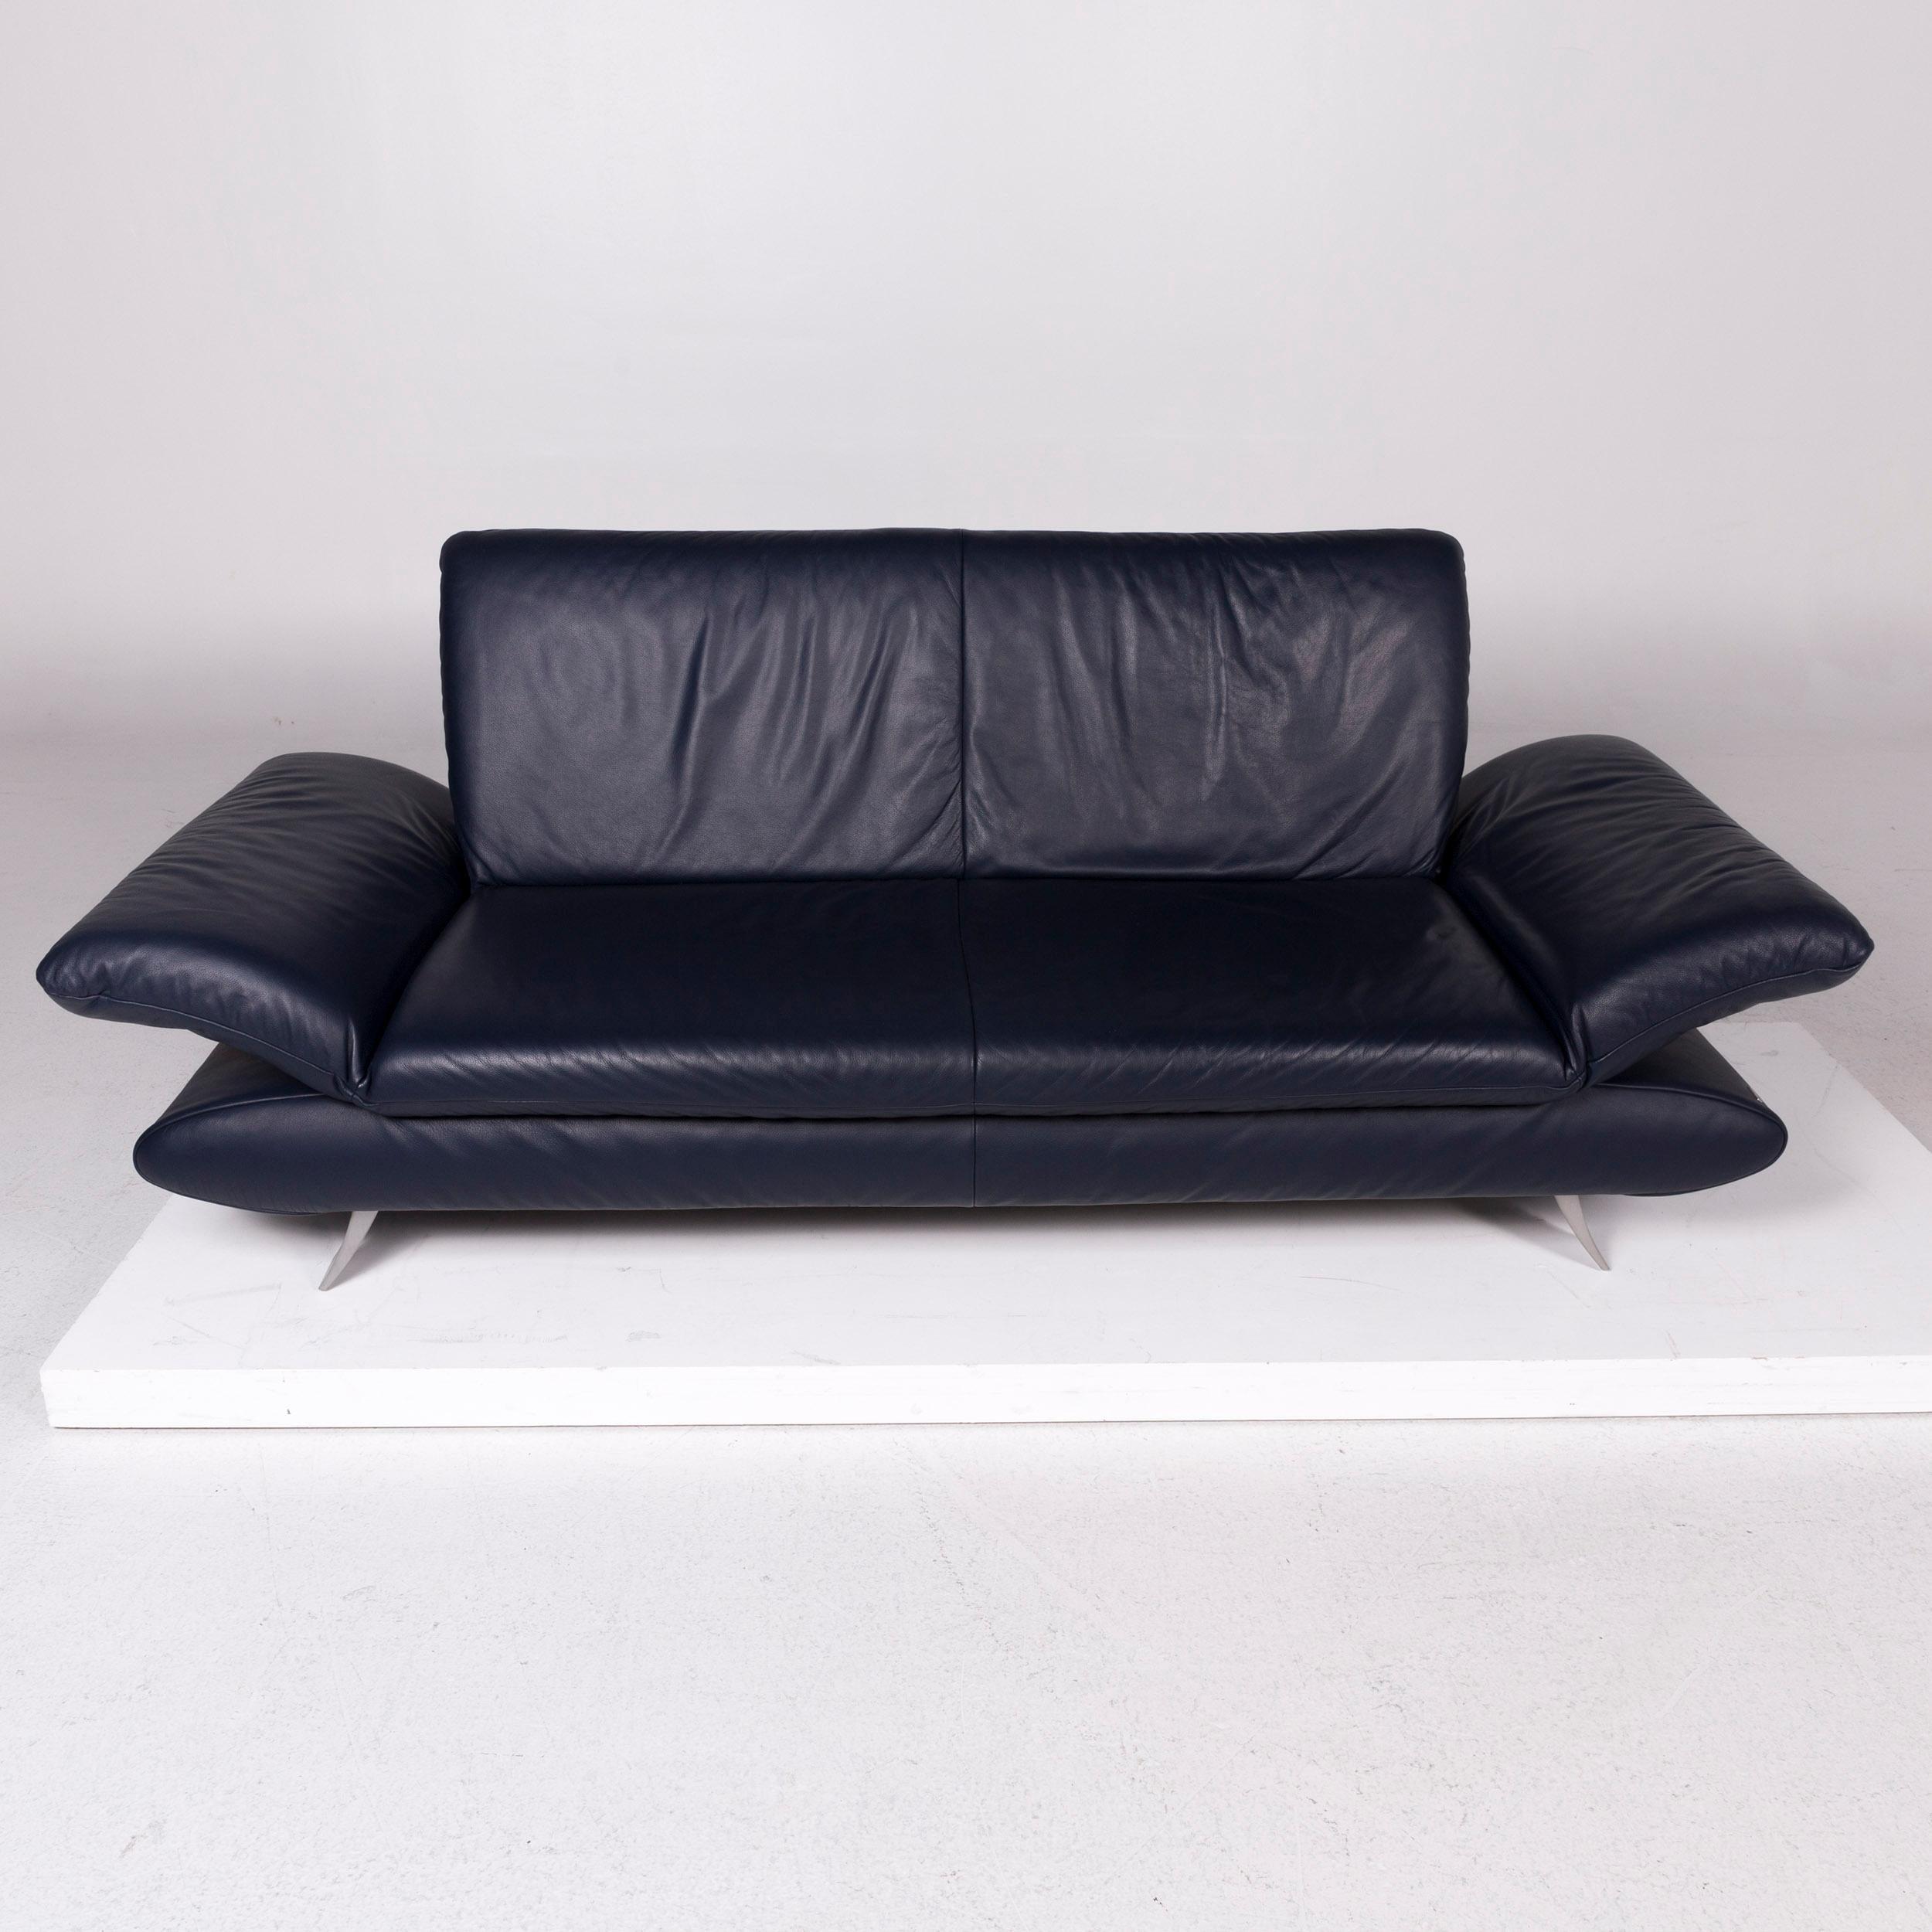 Full Size of Koinor Sofa Uk Couch Gebraucht Erfahrungen Lederfarben Francis Leder Rot 2 Sitzer Rossini Leather Blue Three Seat For Sale At 1stdibs Echtleder Flexform Grau Sofa Koinor Sofa